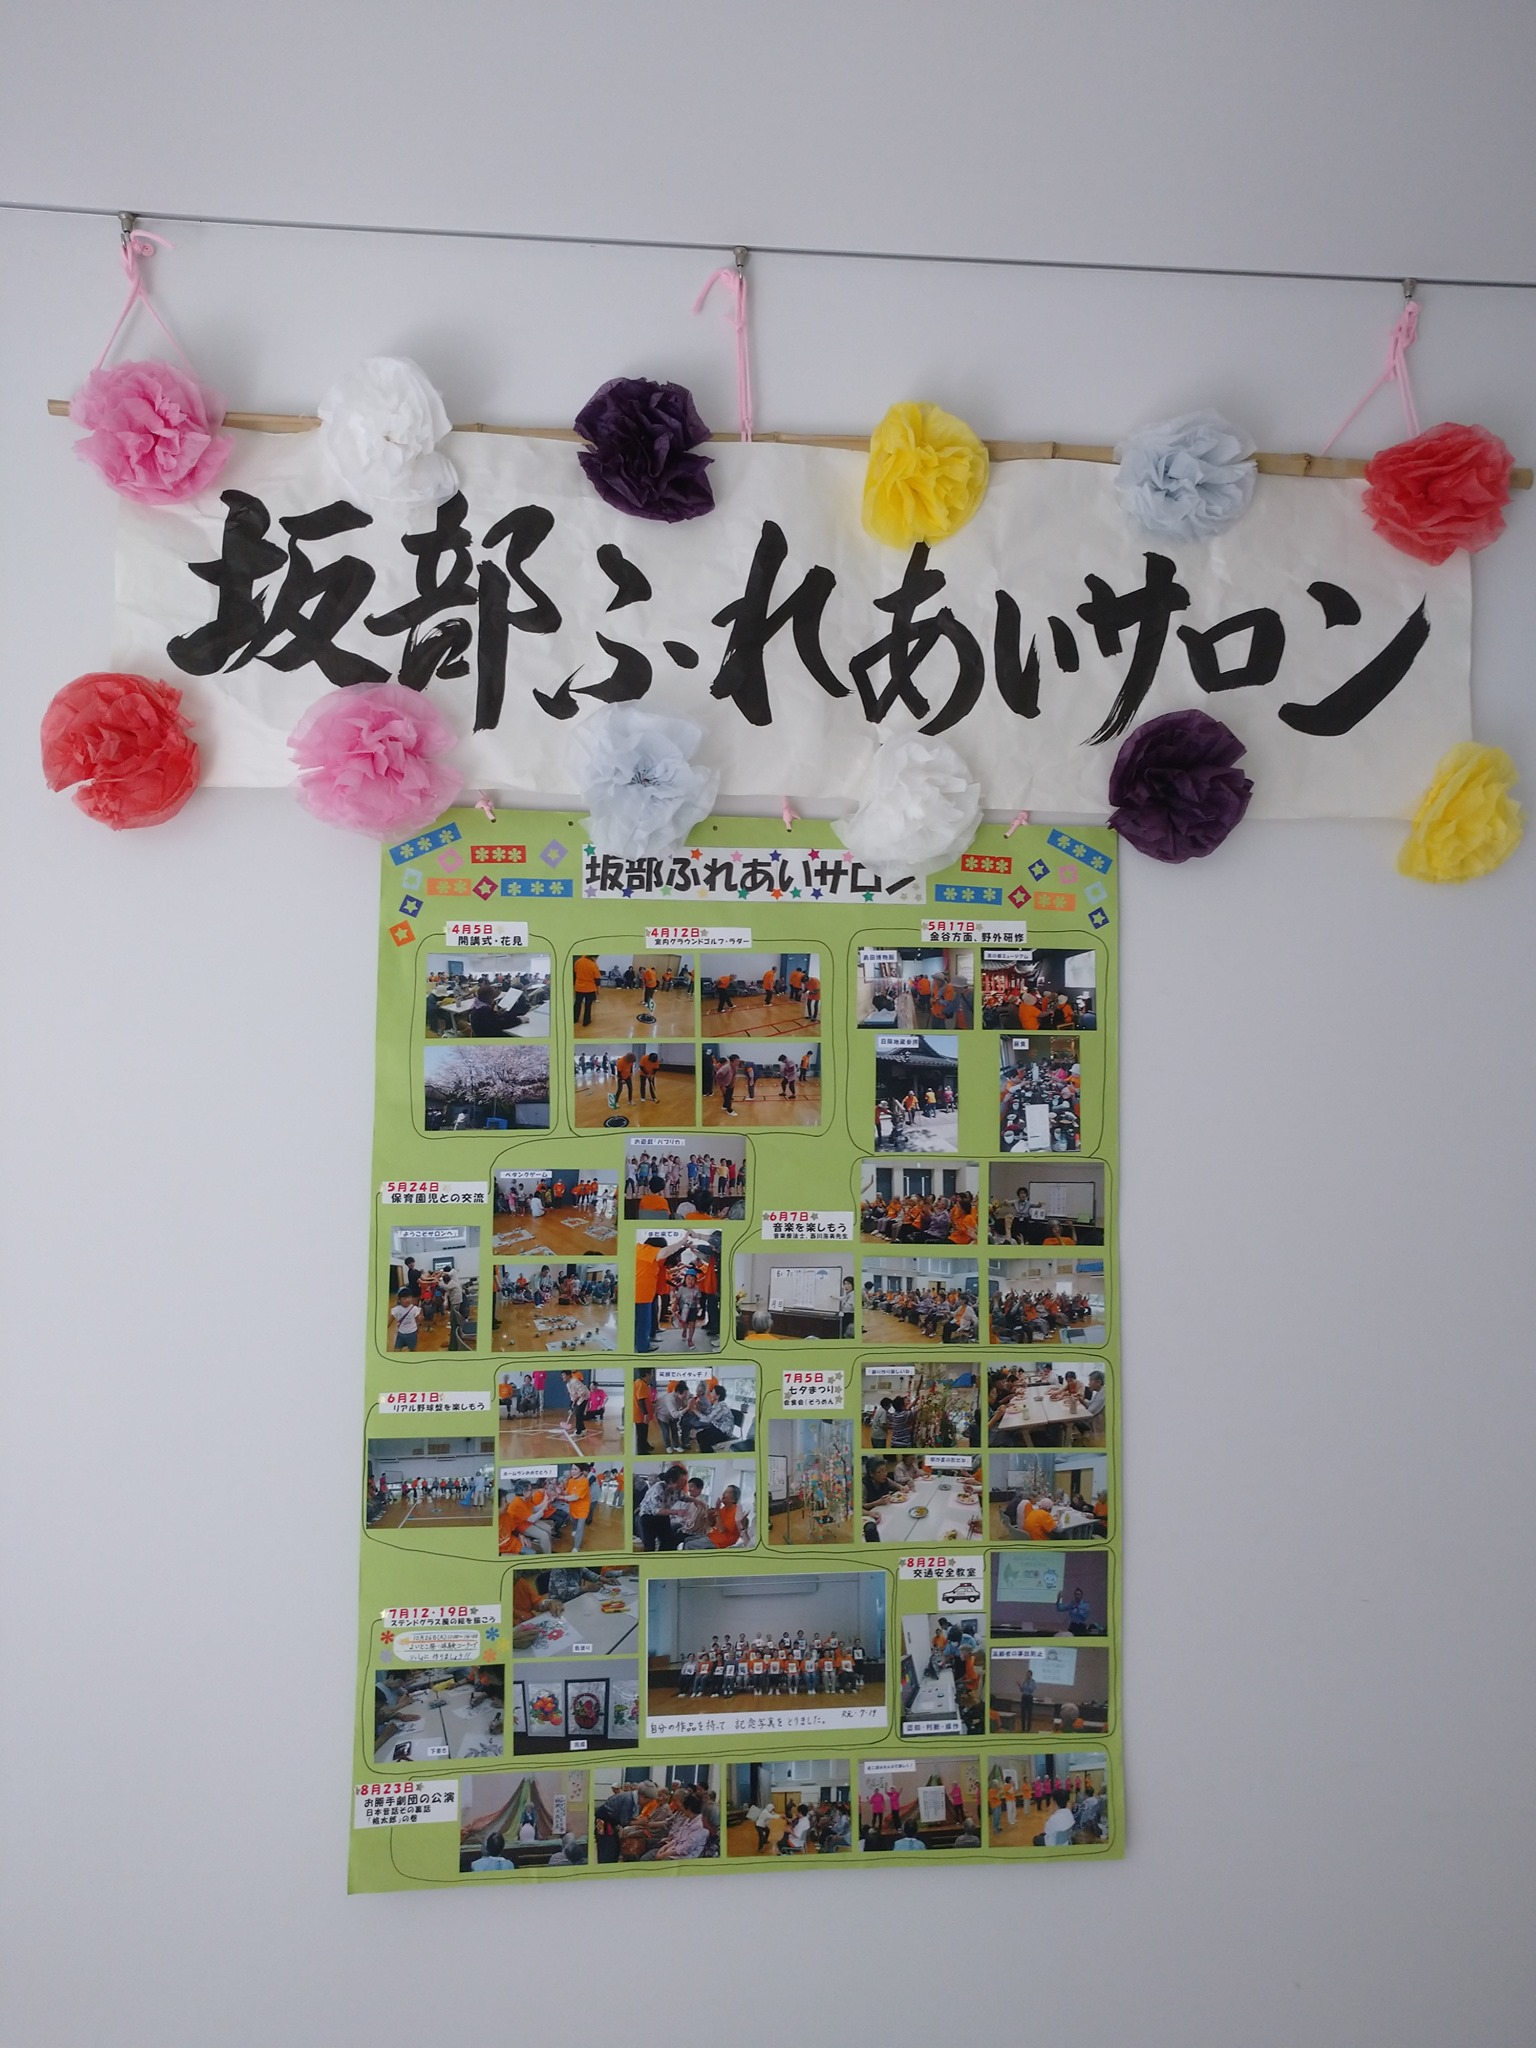 fureai-yoitoko-2019-3.jpg